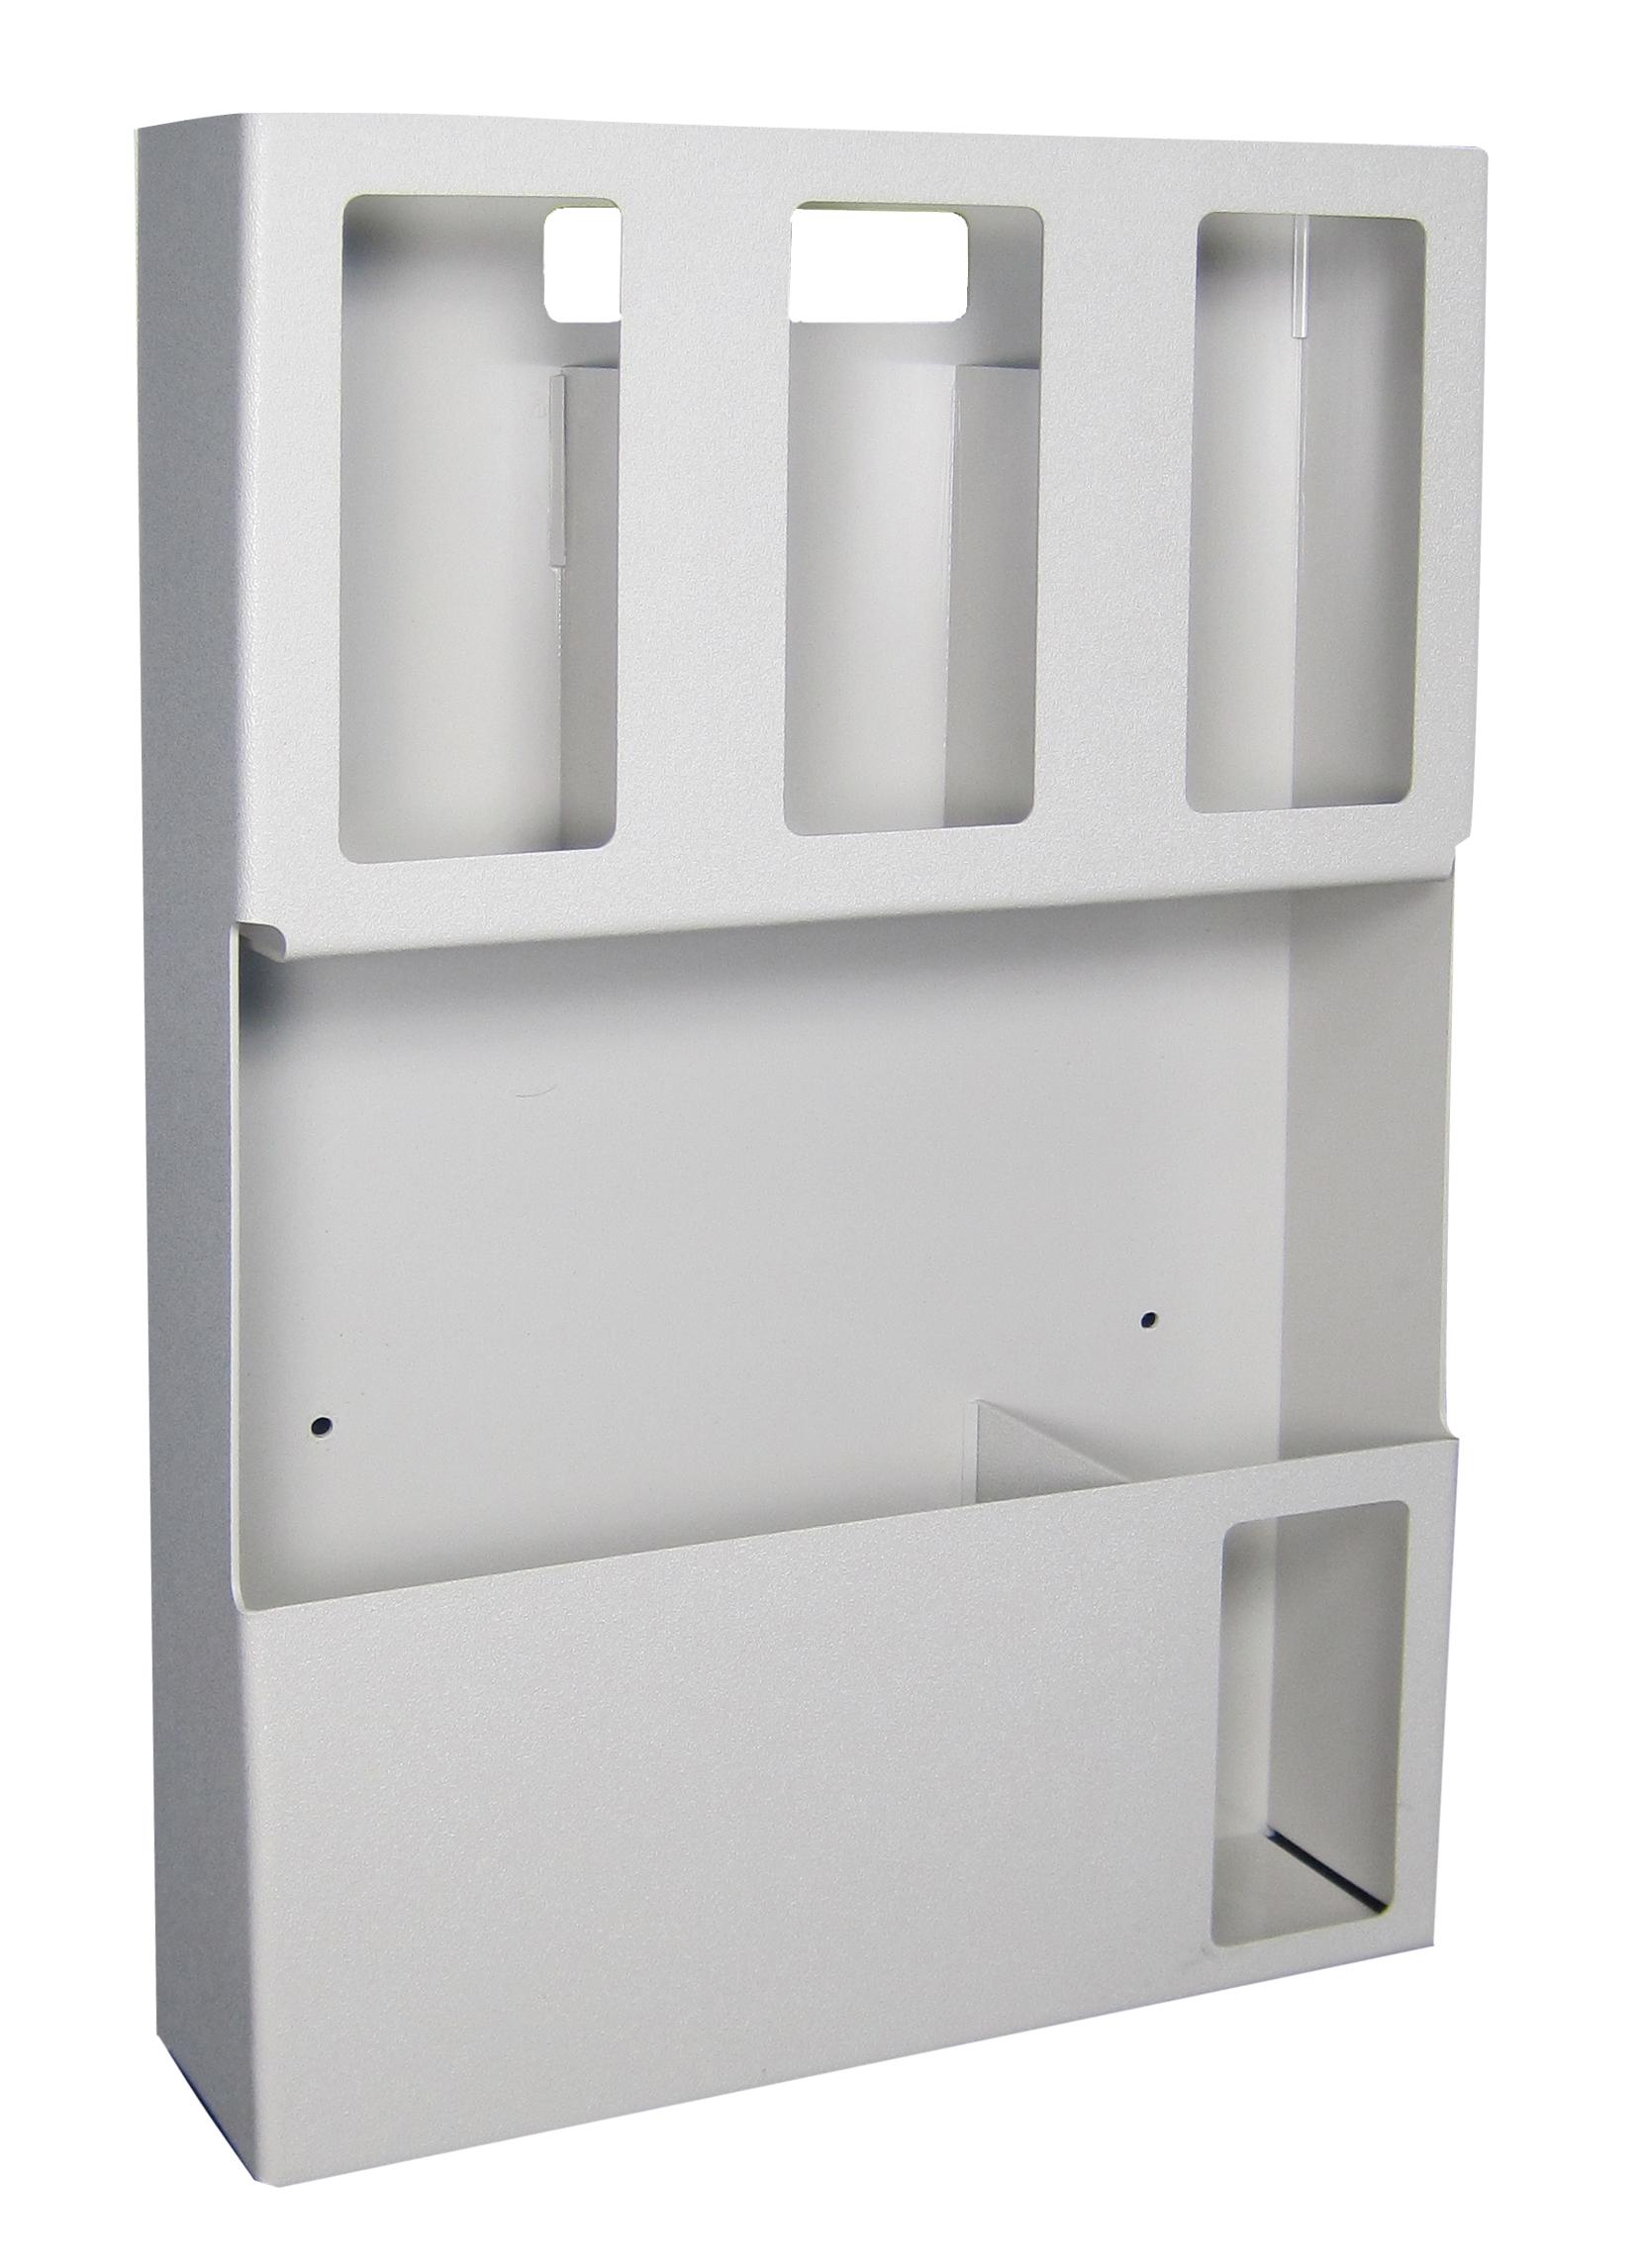 Waterloo ISOORG-1 PPE Organizer/Dispenser